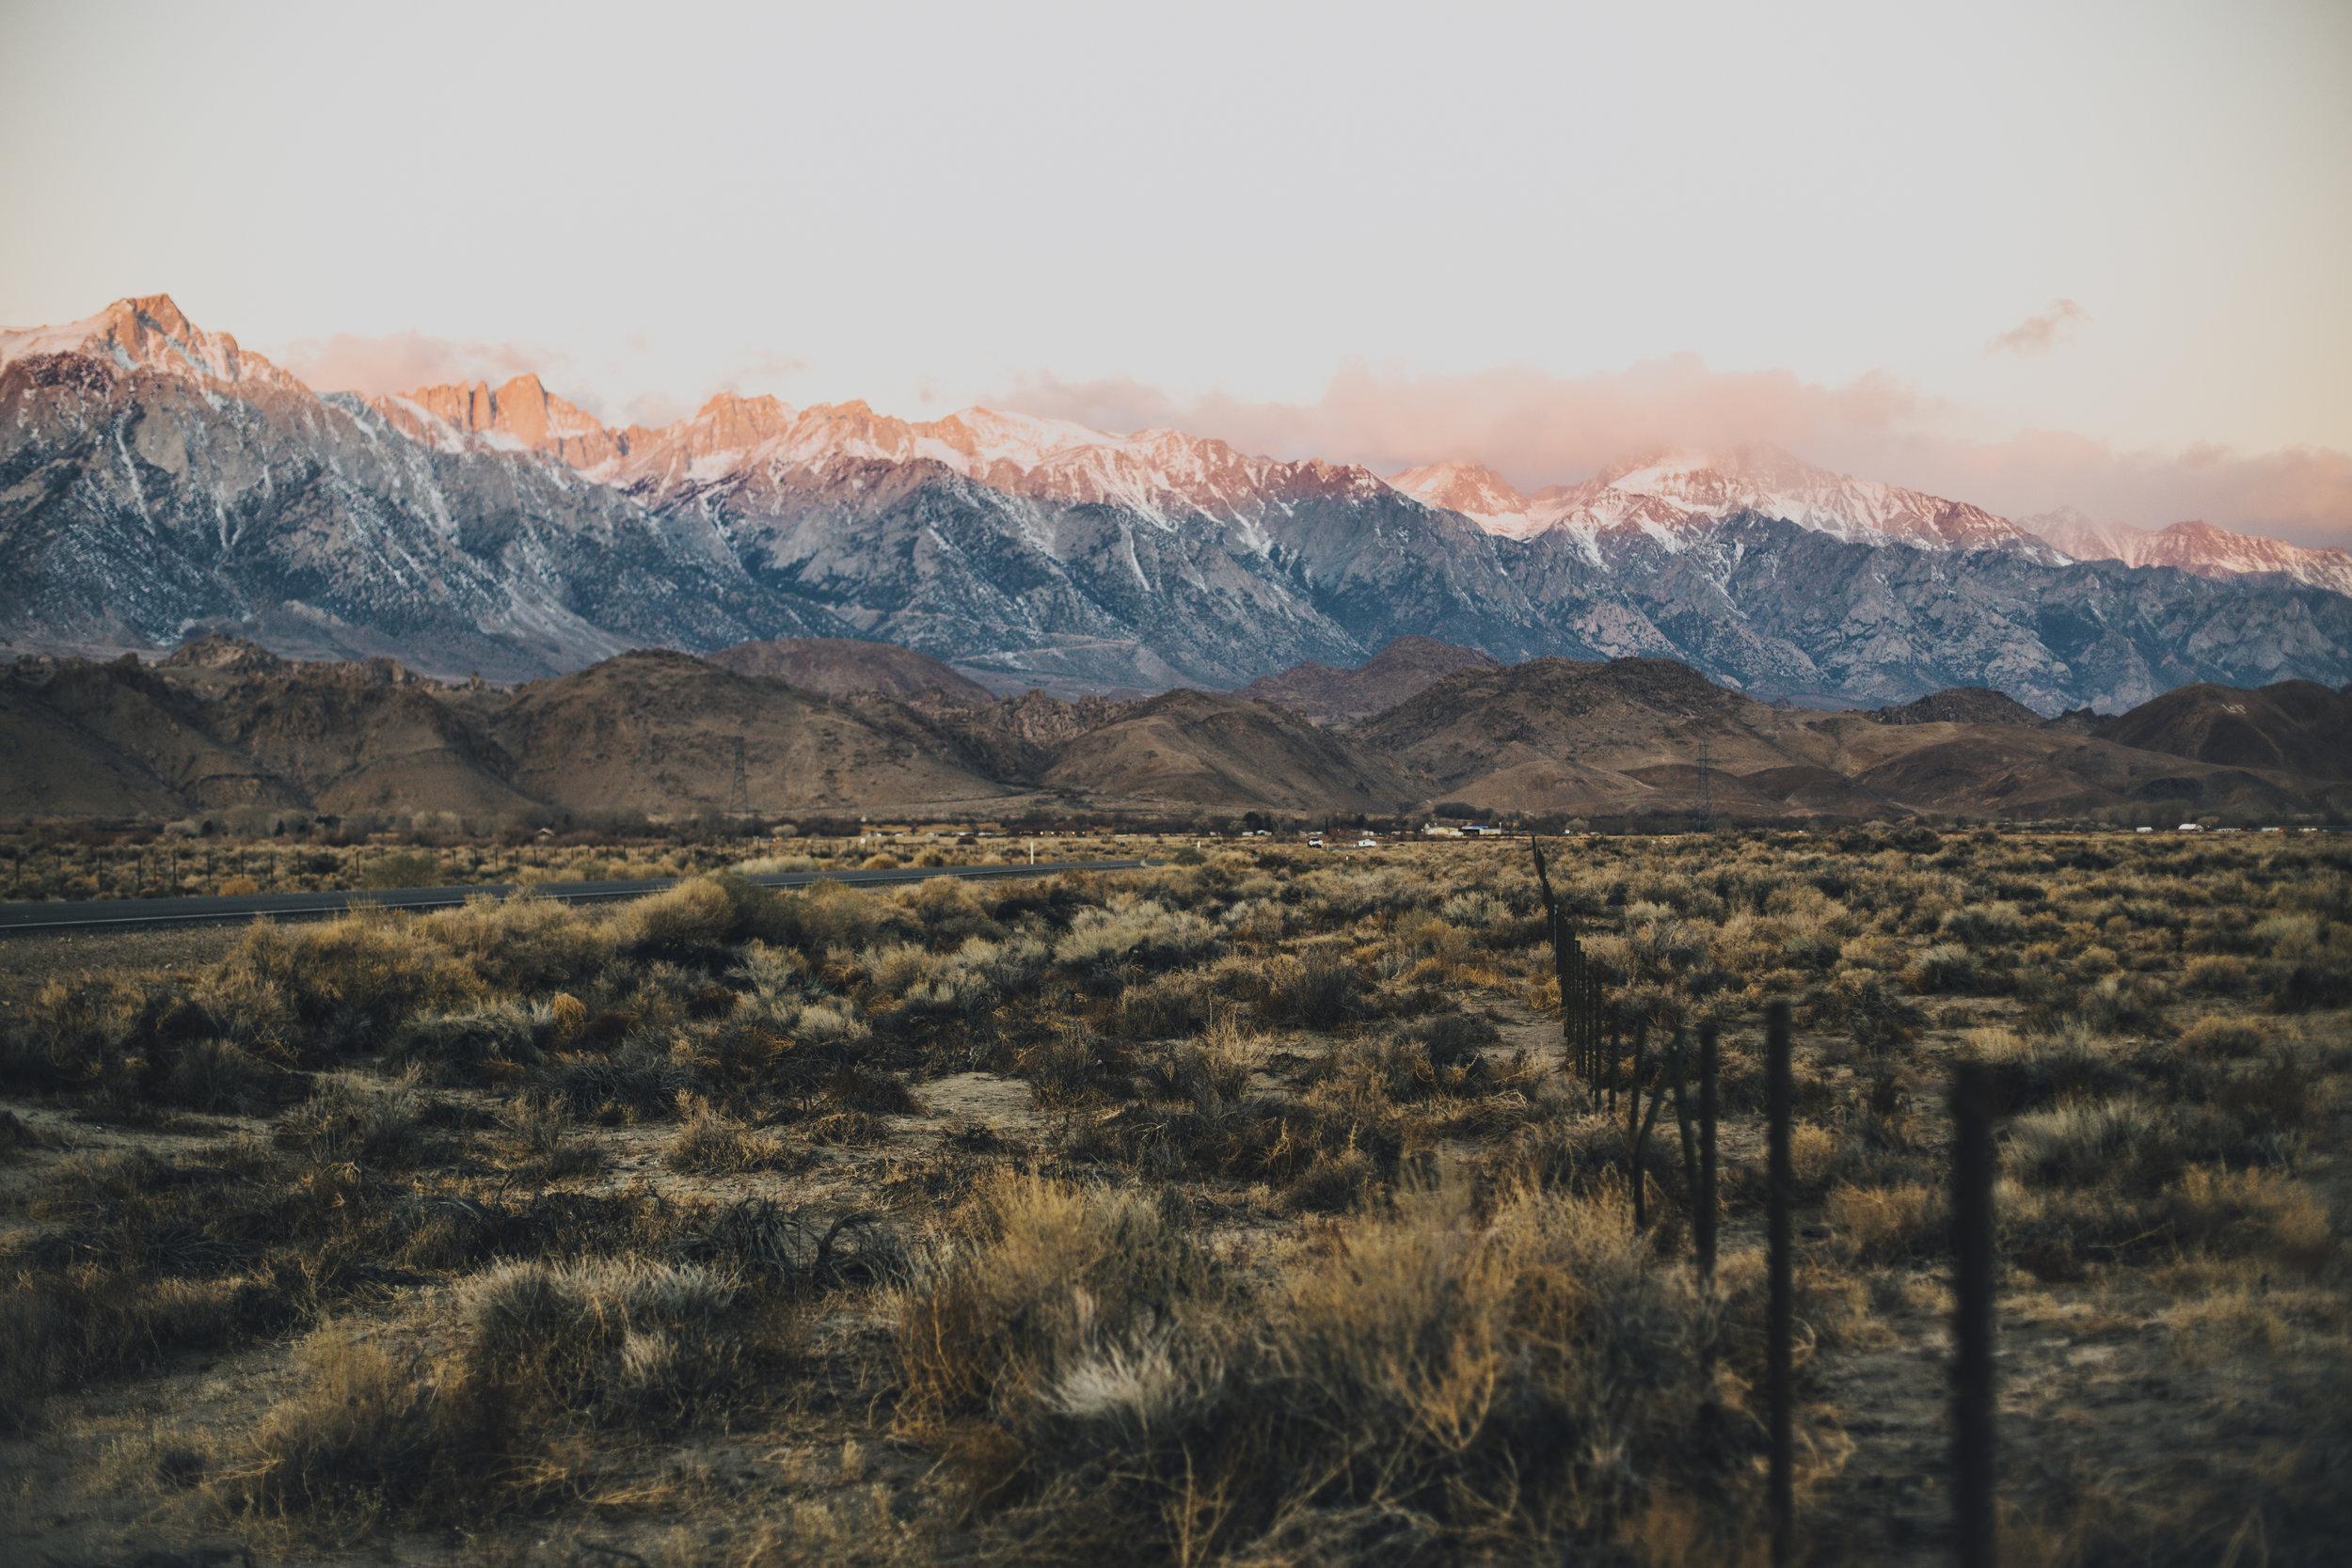 Lone Pine, CA